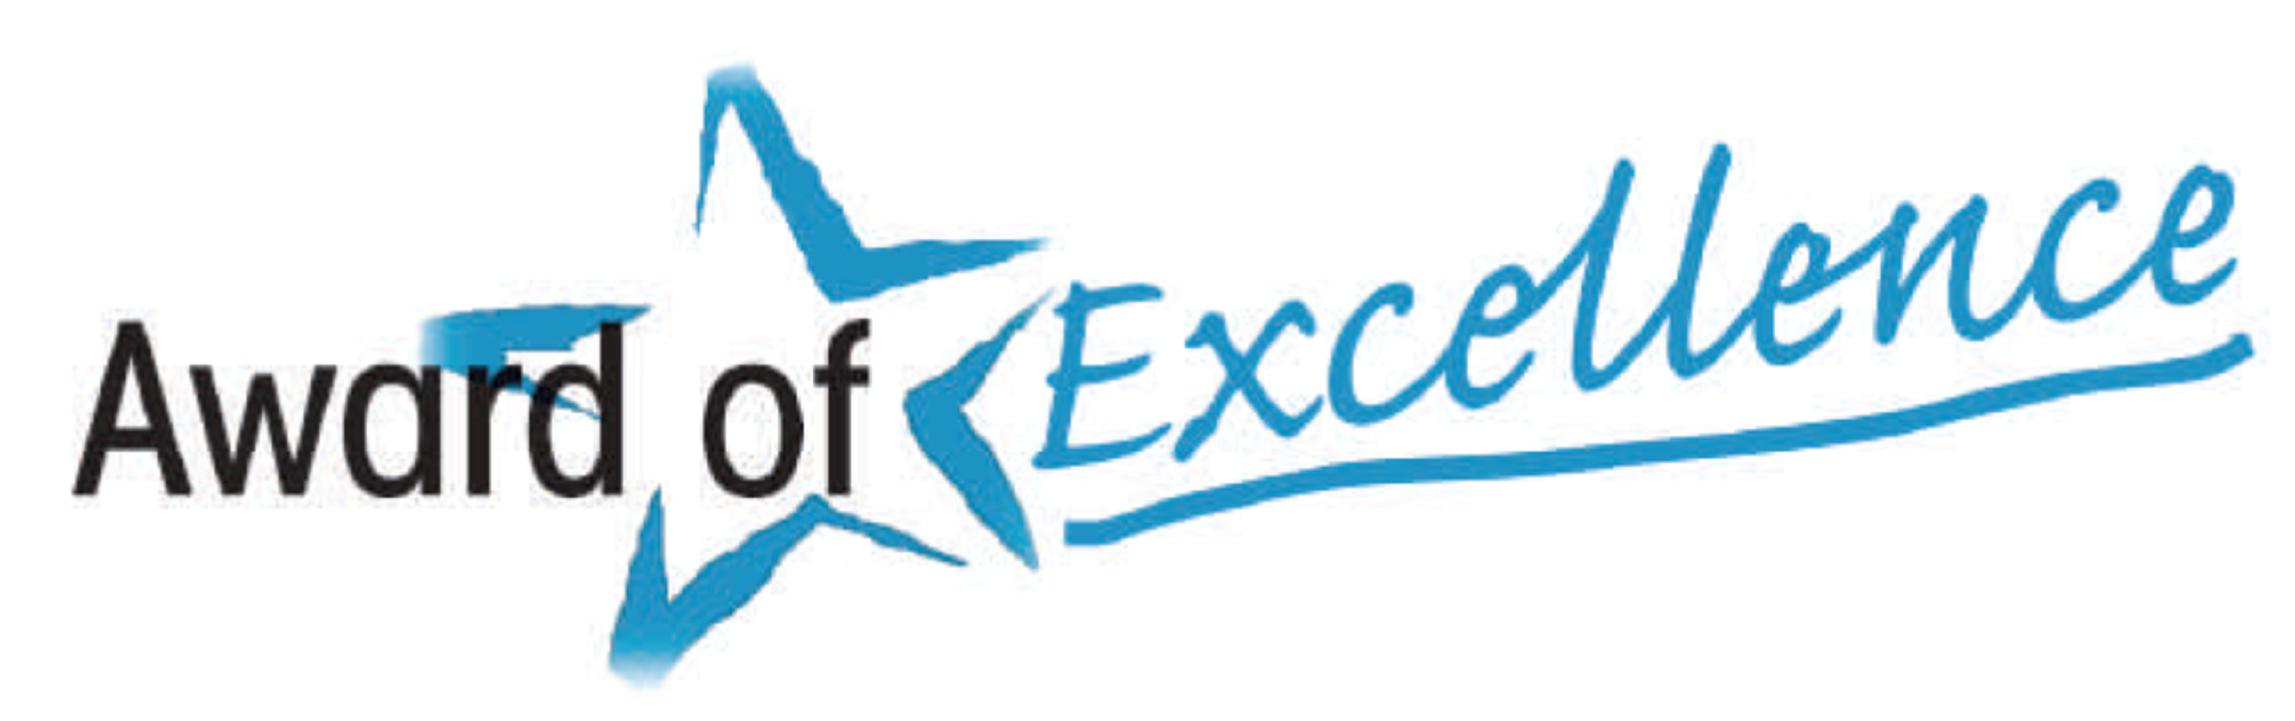 Avir 2014 Award Of Exc...